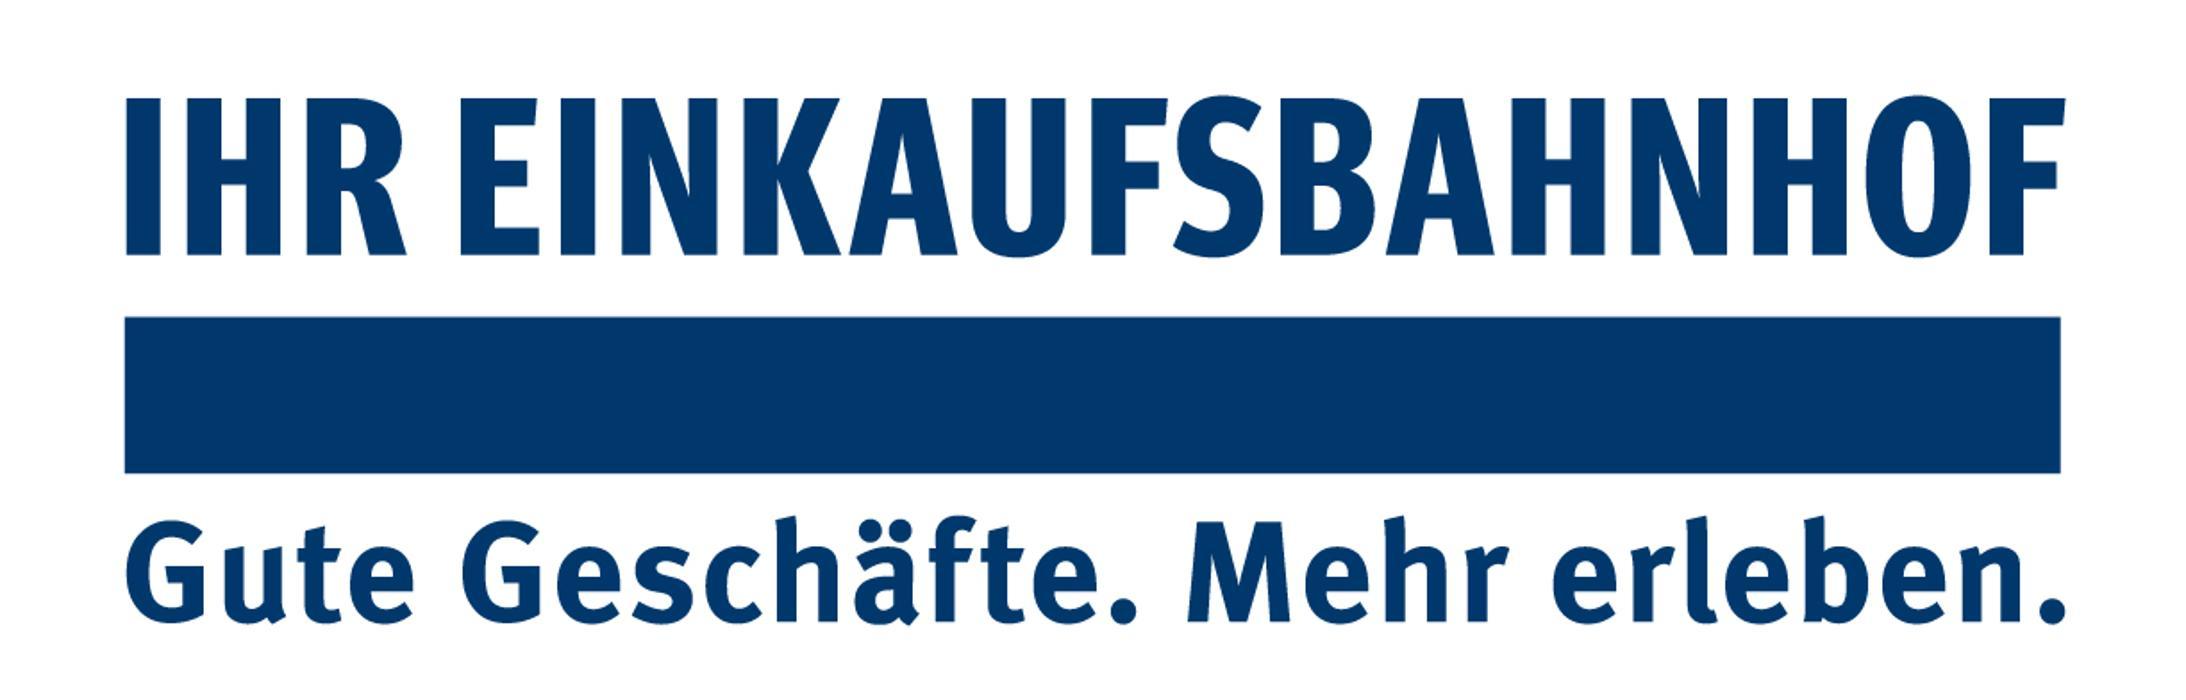 Einkaufsbahnhof Hamburg Hbf